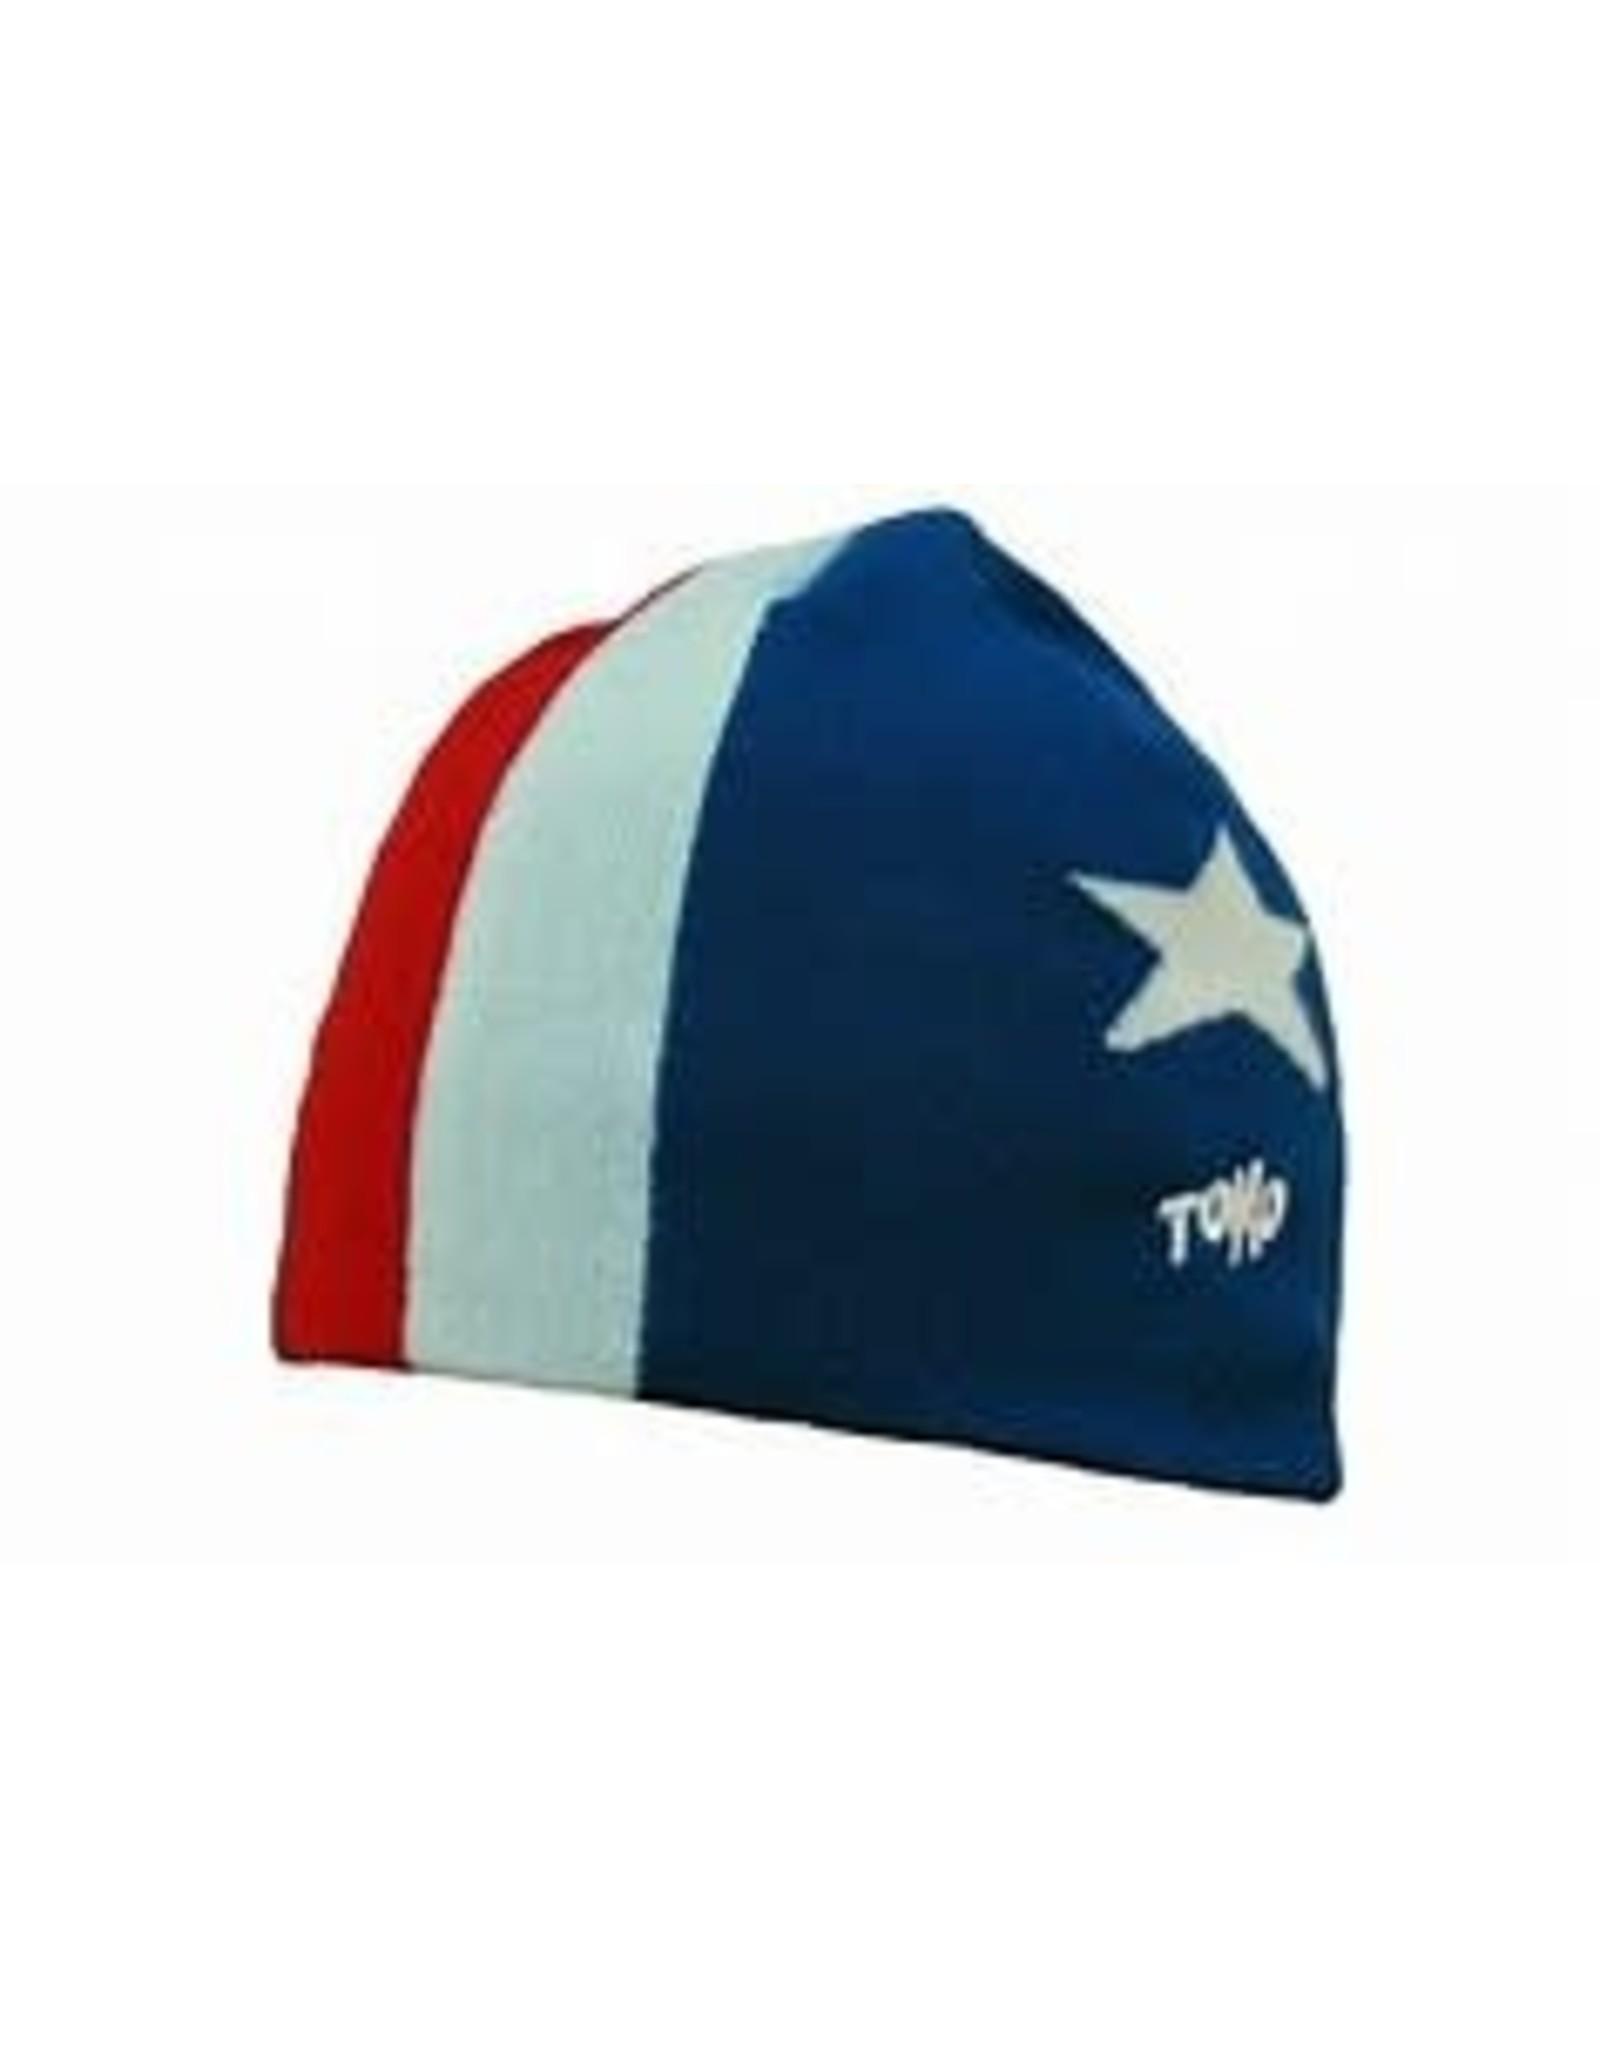 Toko Toko Team America Hat